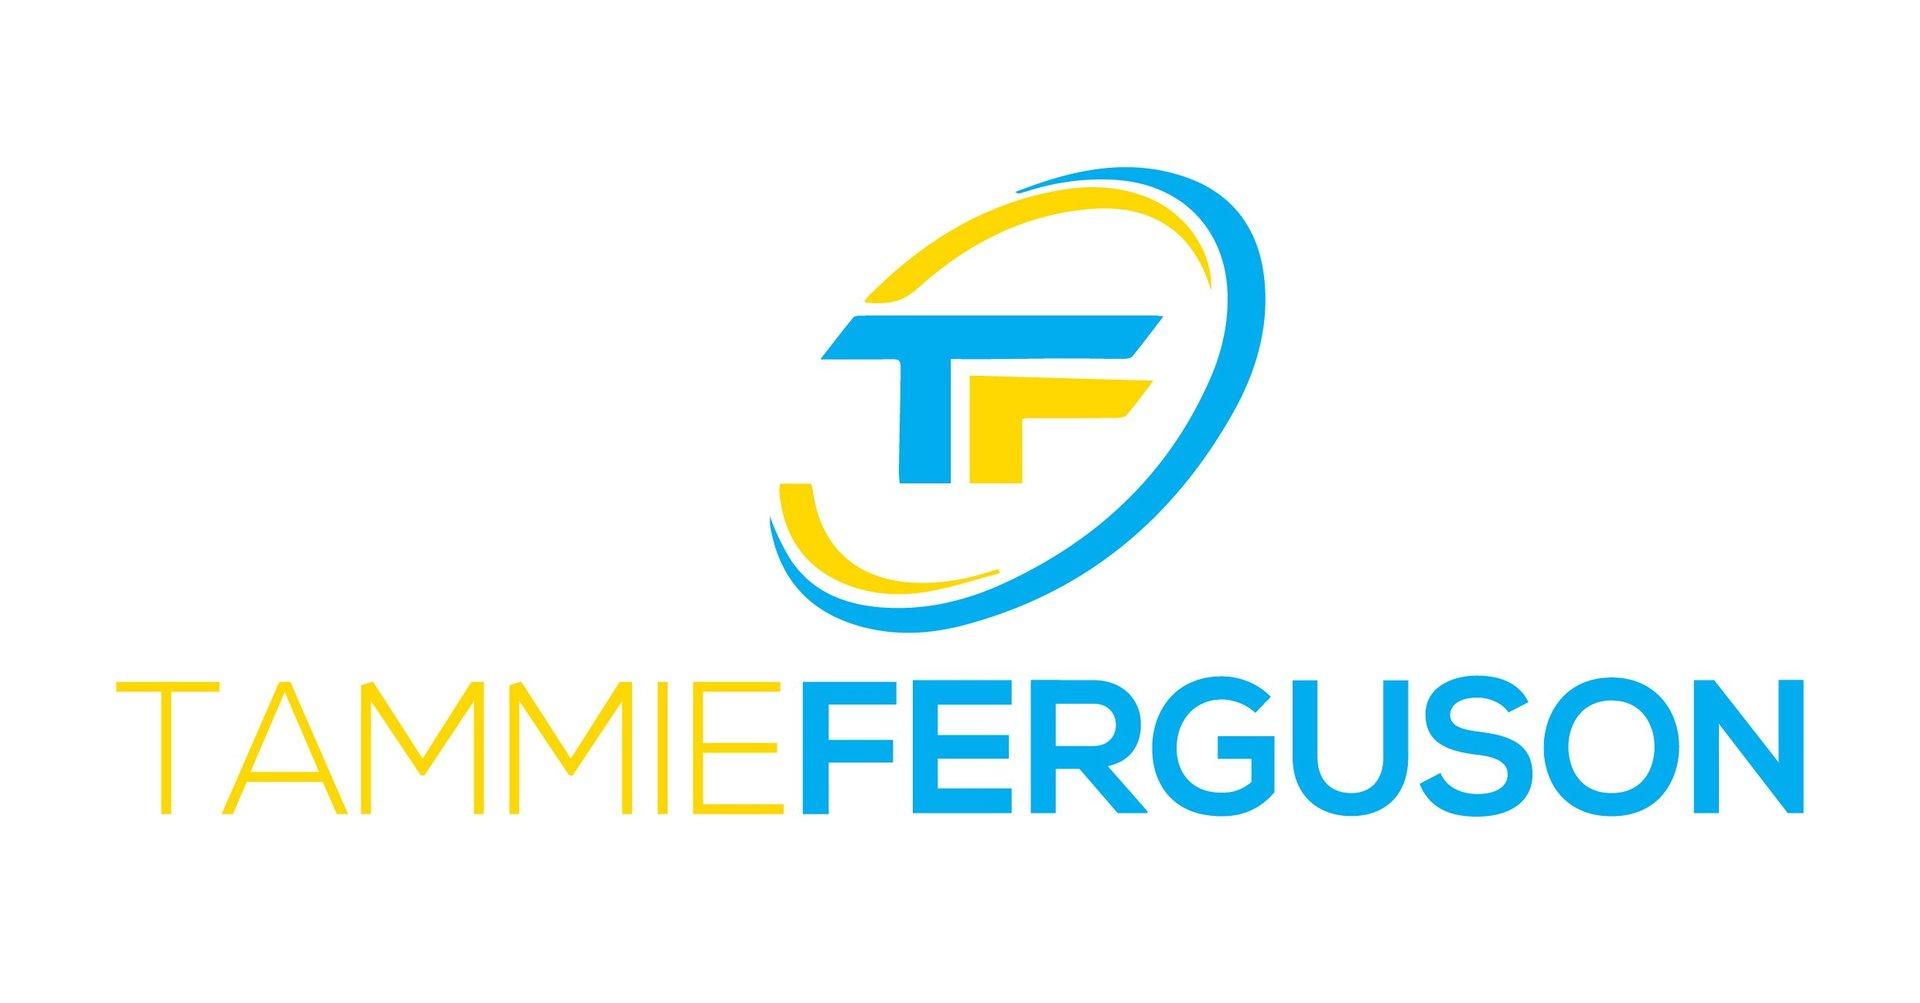 Tammie Ferguson logo